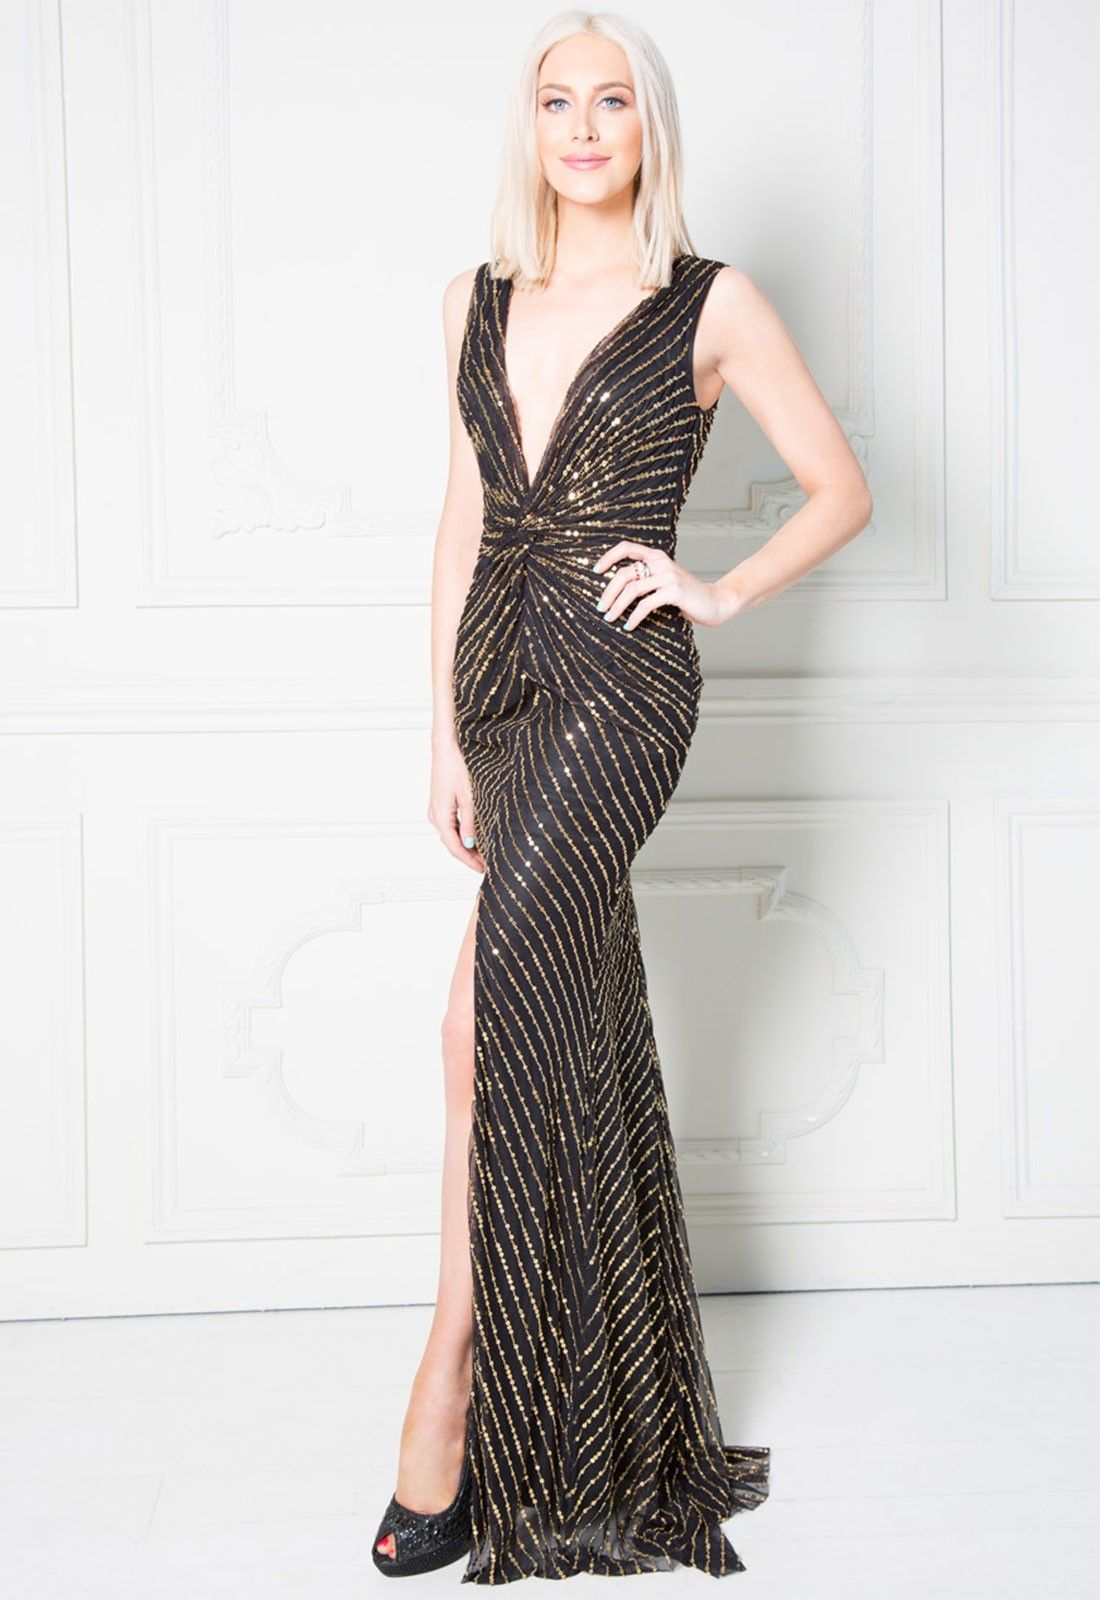 baf6f7aa268 Stephanie Pratt Deep V Neck Sequin Maxi Dress With Front Split in ...